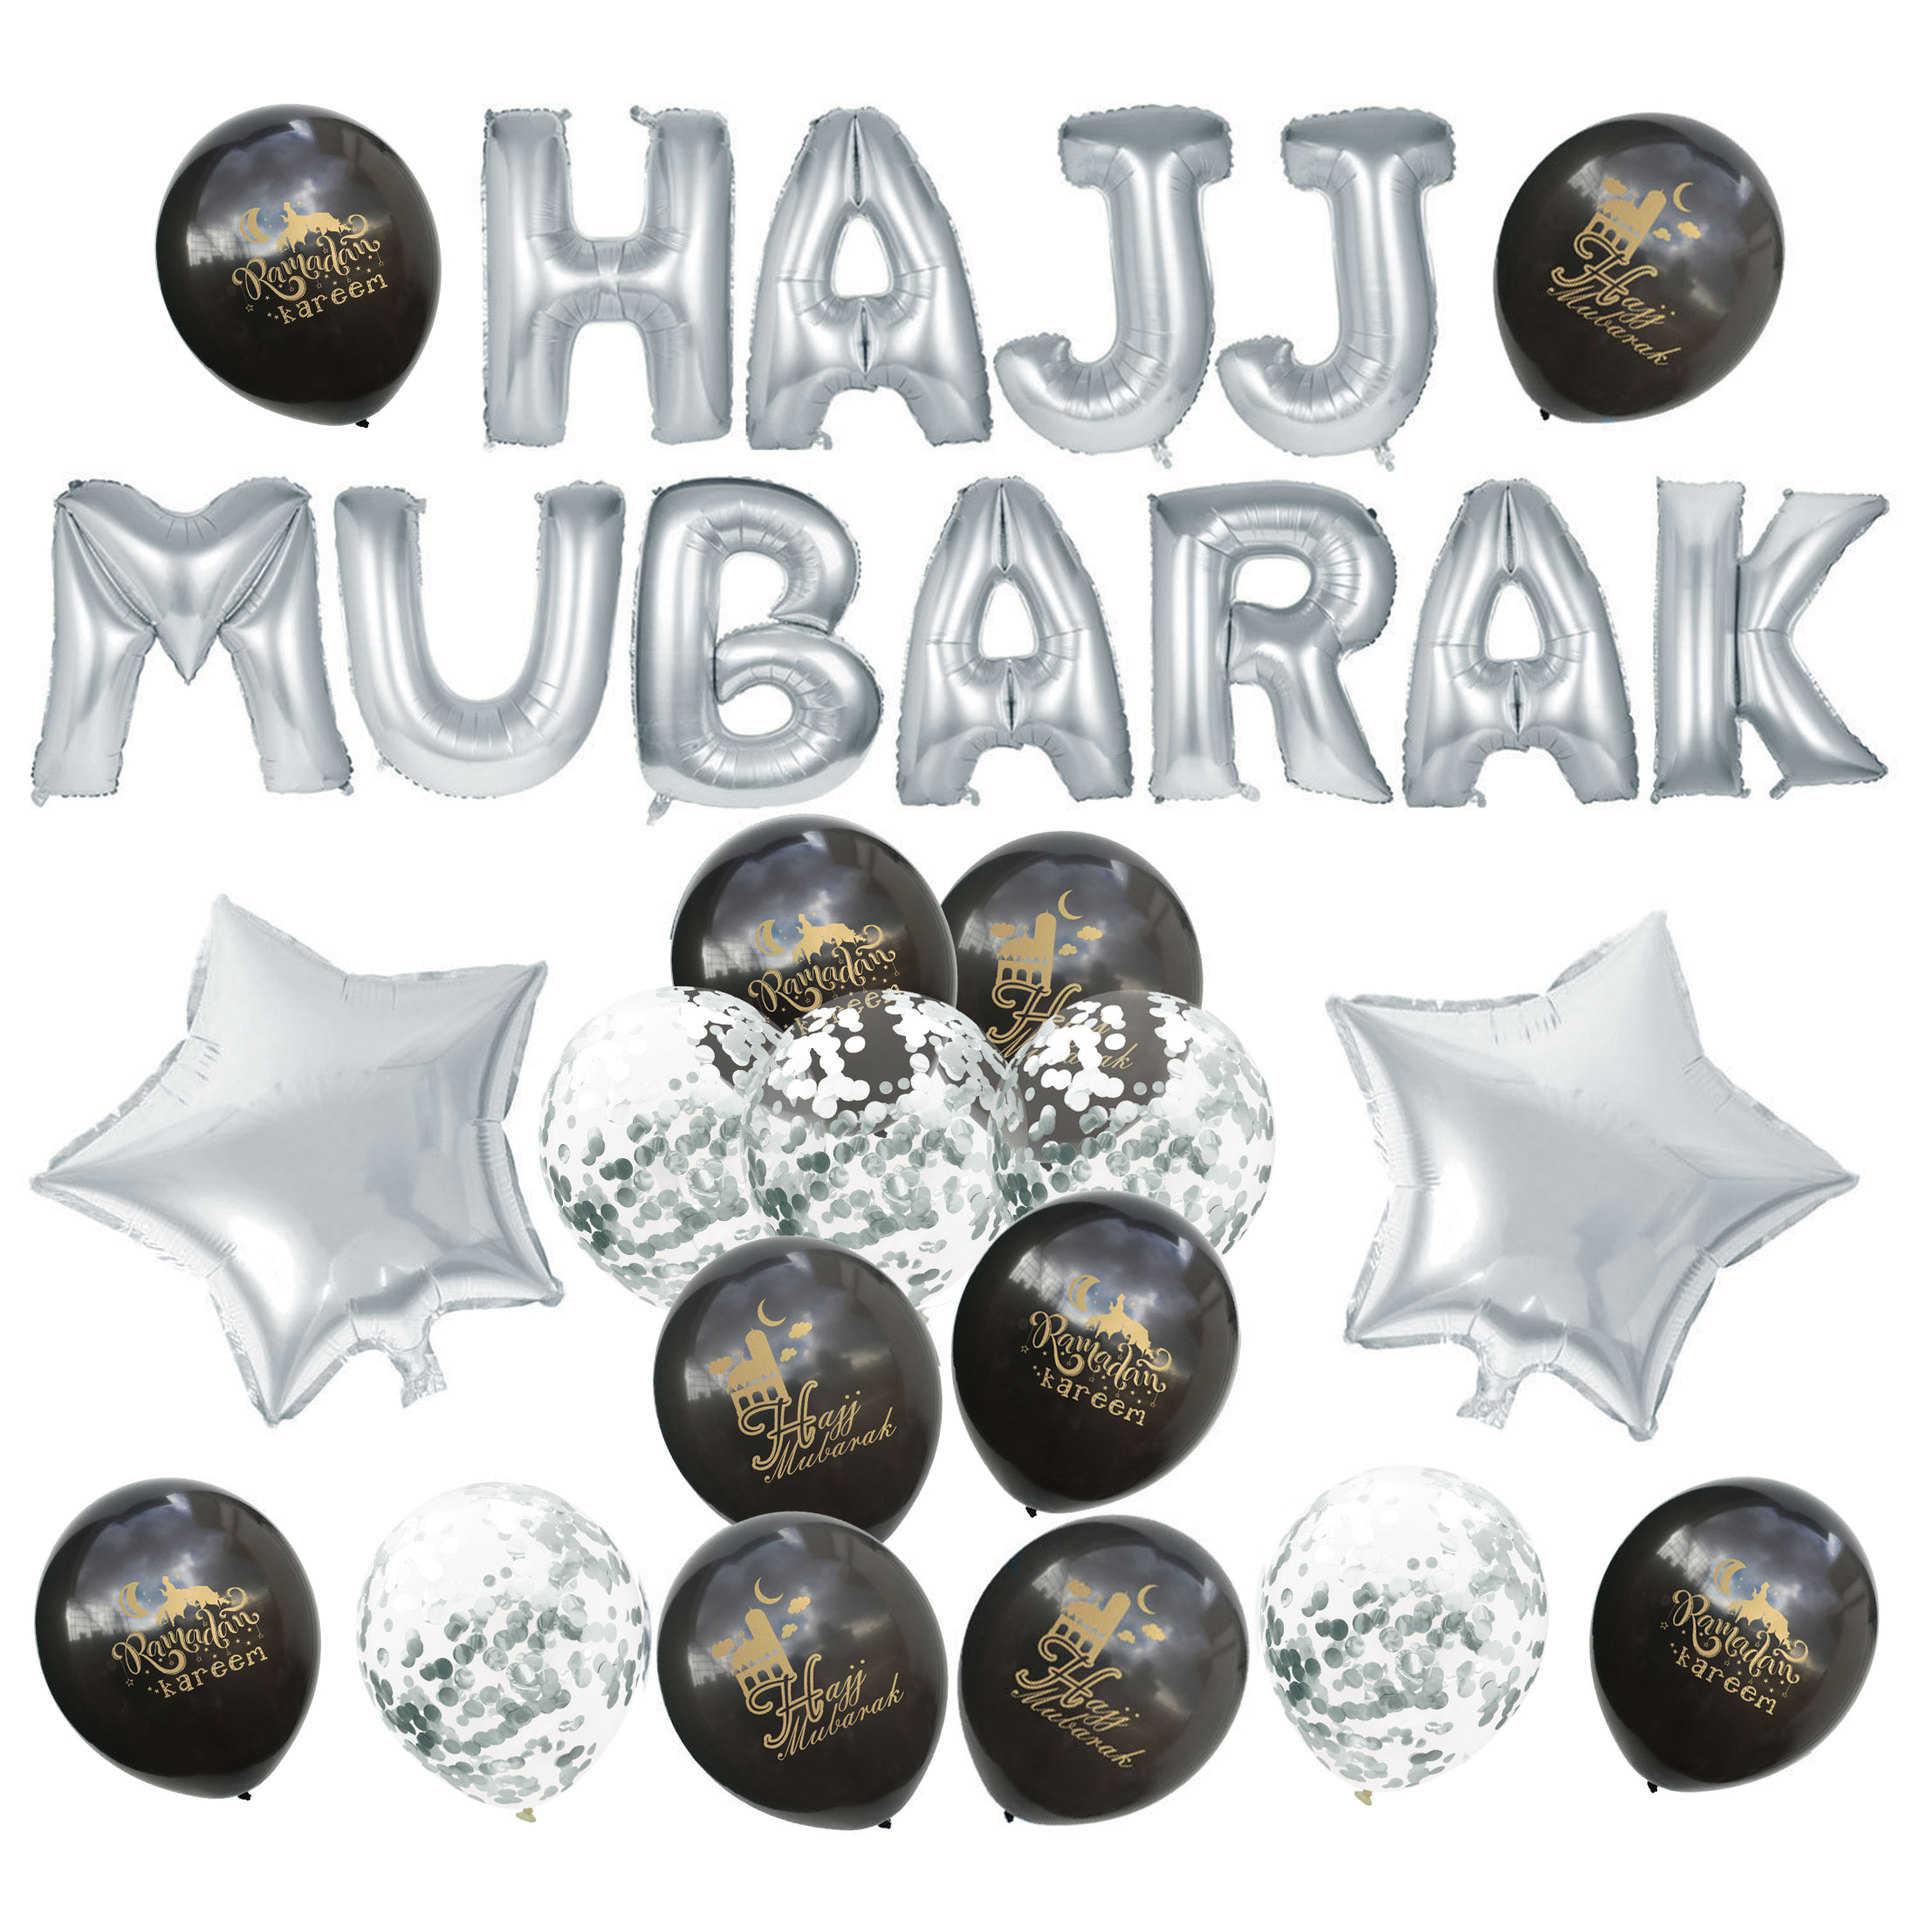 Ouro Prata Preto Eid MUBARAK Al-Fitr HAJJ Balões DIY Conjunto Lasser Bairam Ramadan Festa Confetti Da Folha De Balões de Látex decoração do jardim